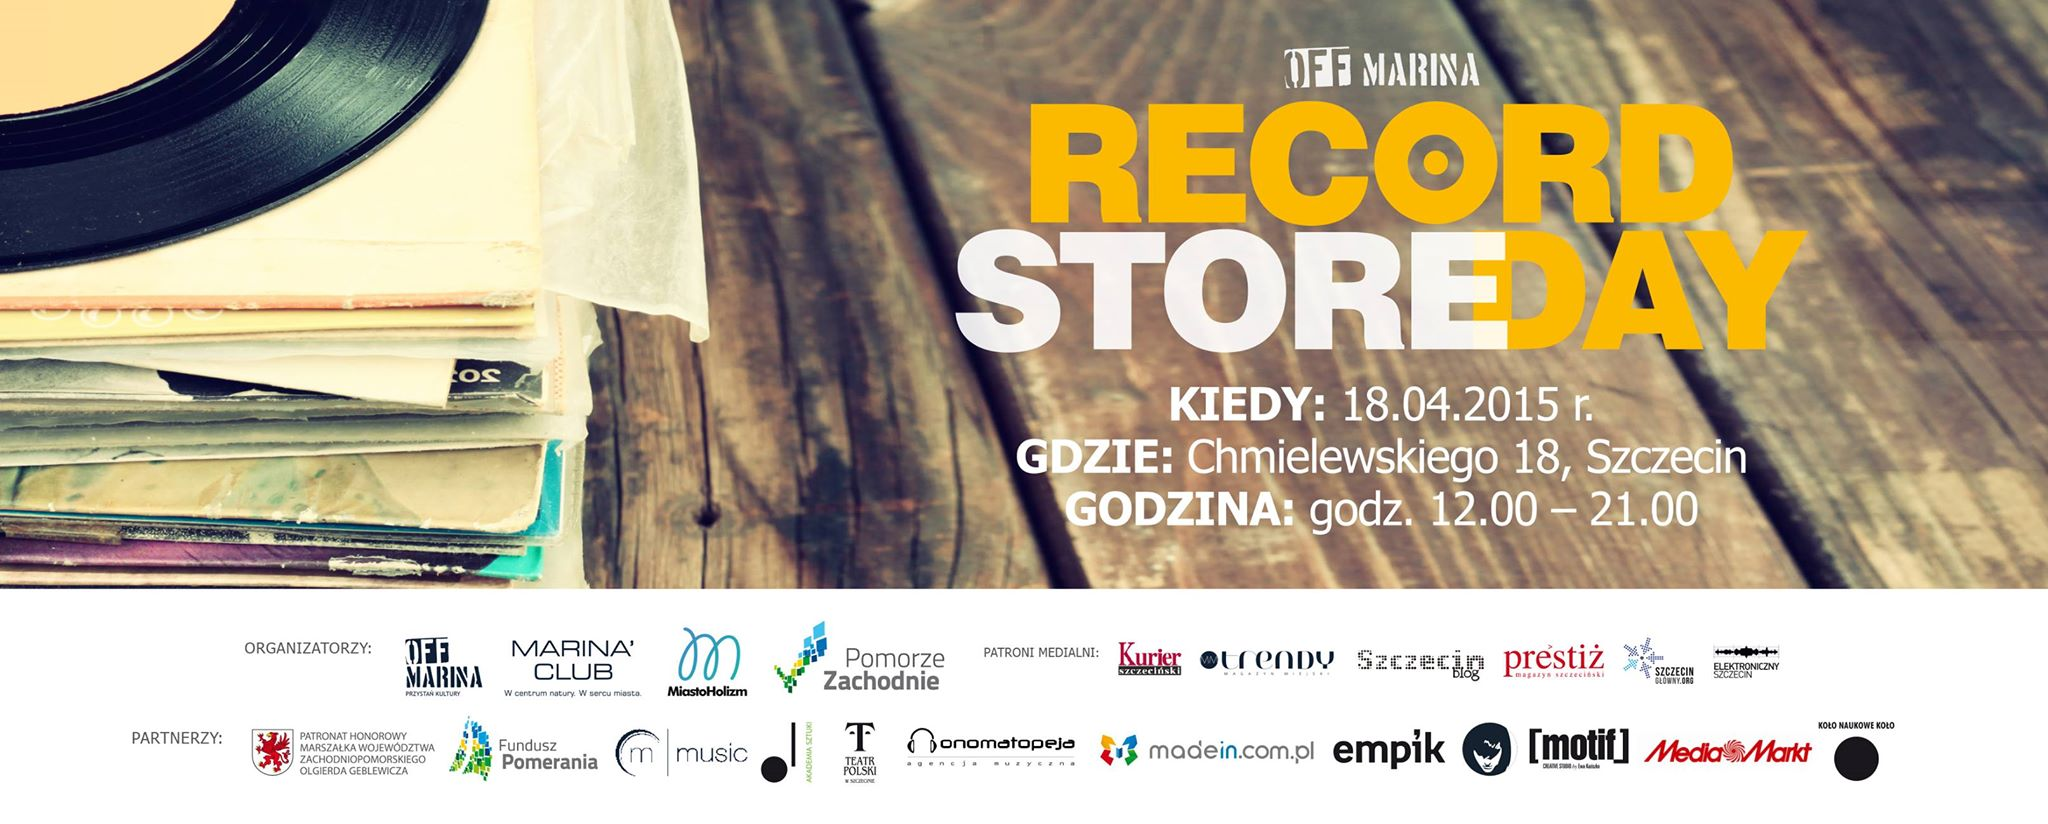 off-marina-record-day-szczecin-04